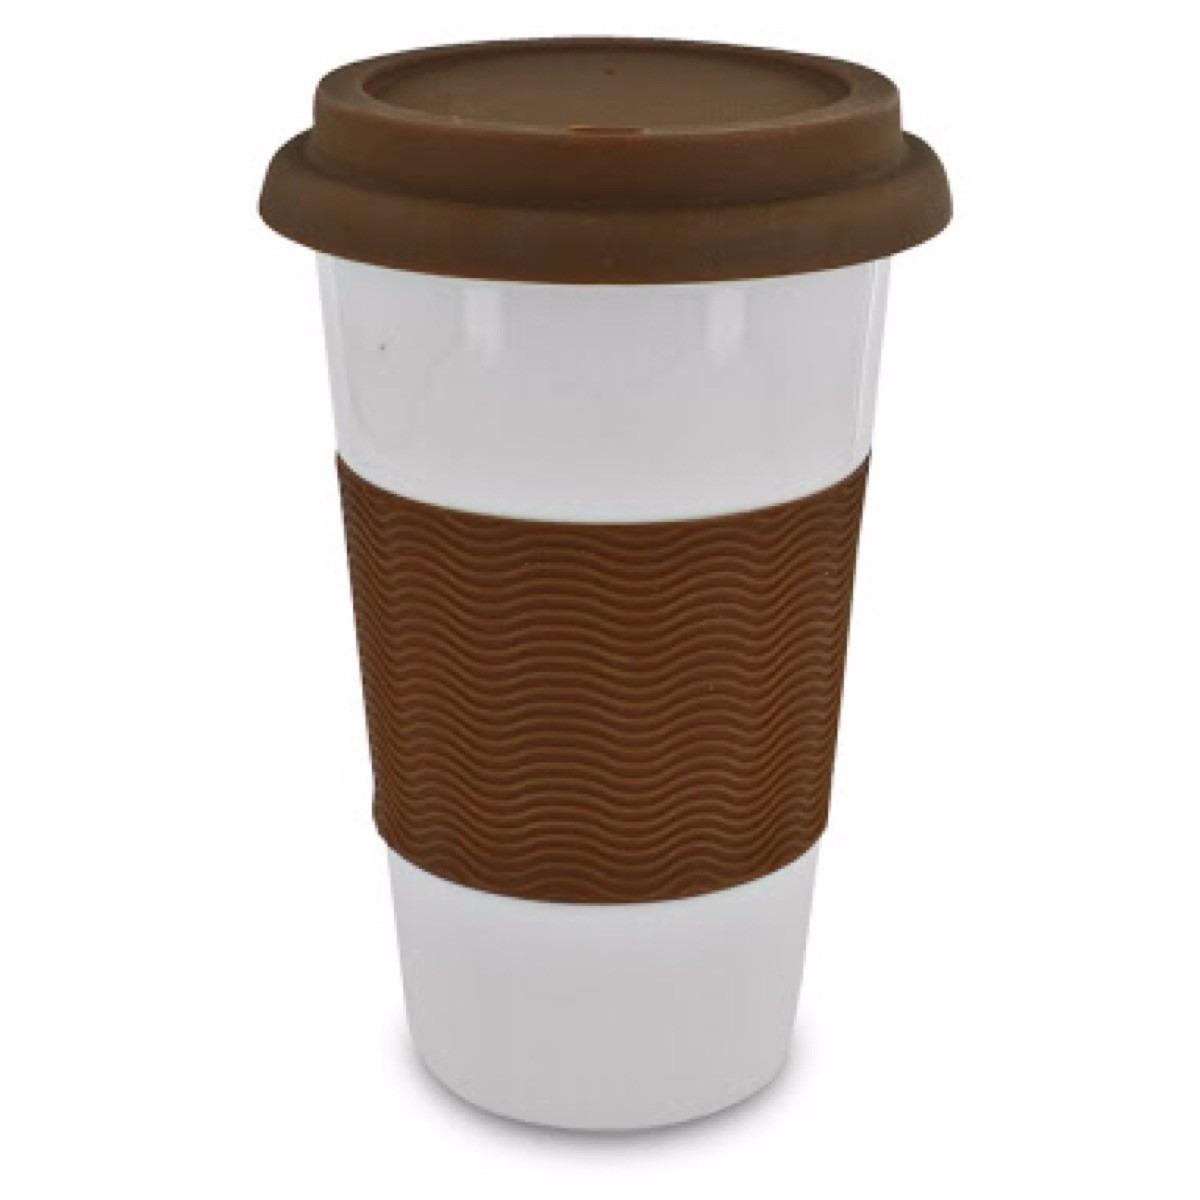 copo-cafe-starbucks-ceramica-termico-tampa-mug-tumblers-D_NQ_NP_162011-MLB20463192742_102015-F (1)